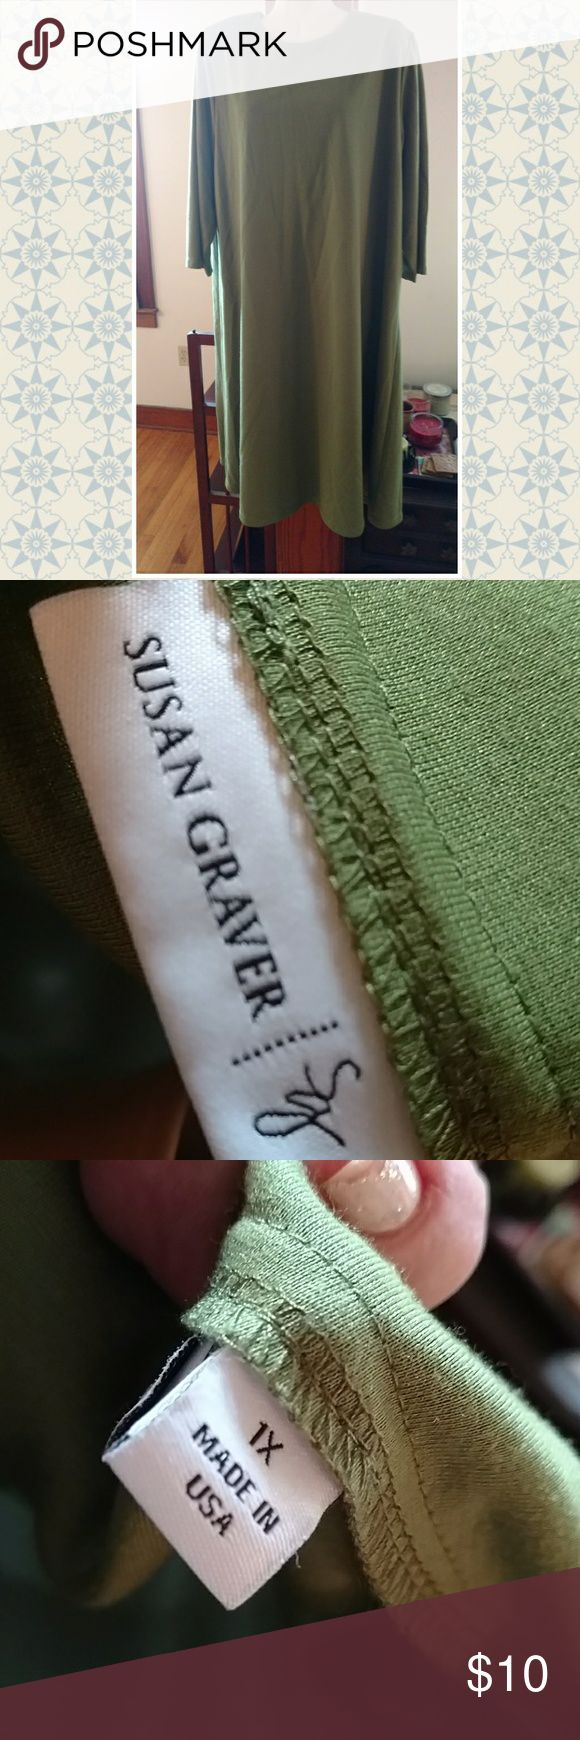 Susan graver 1x dress Lighter olive dress w 3/4 sleeves. Sz 1x Susan Graver Dresses